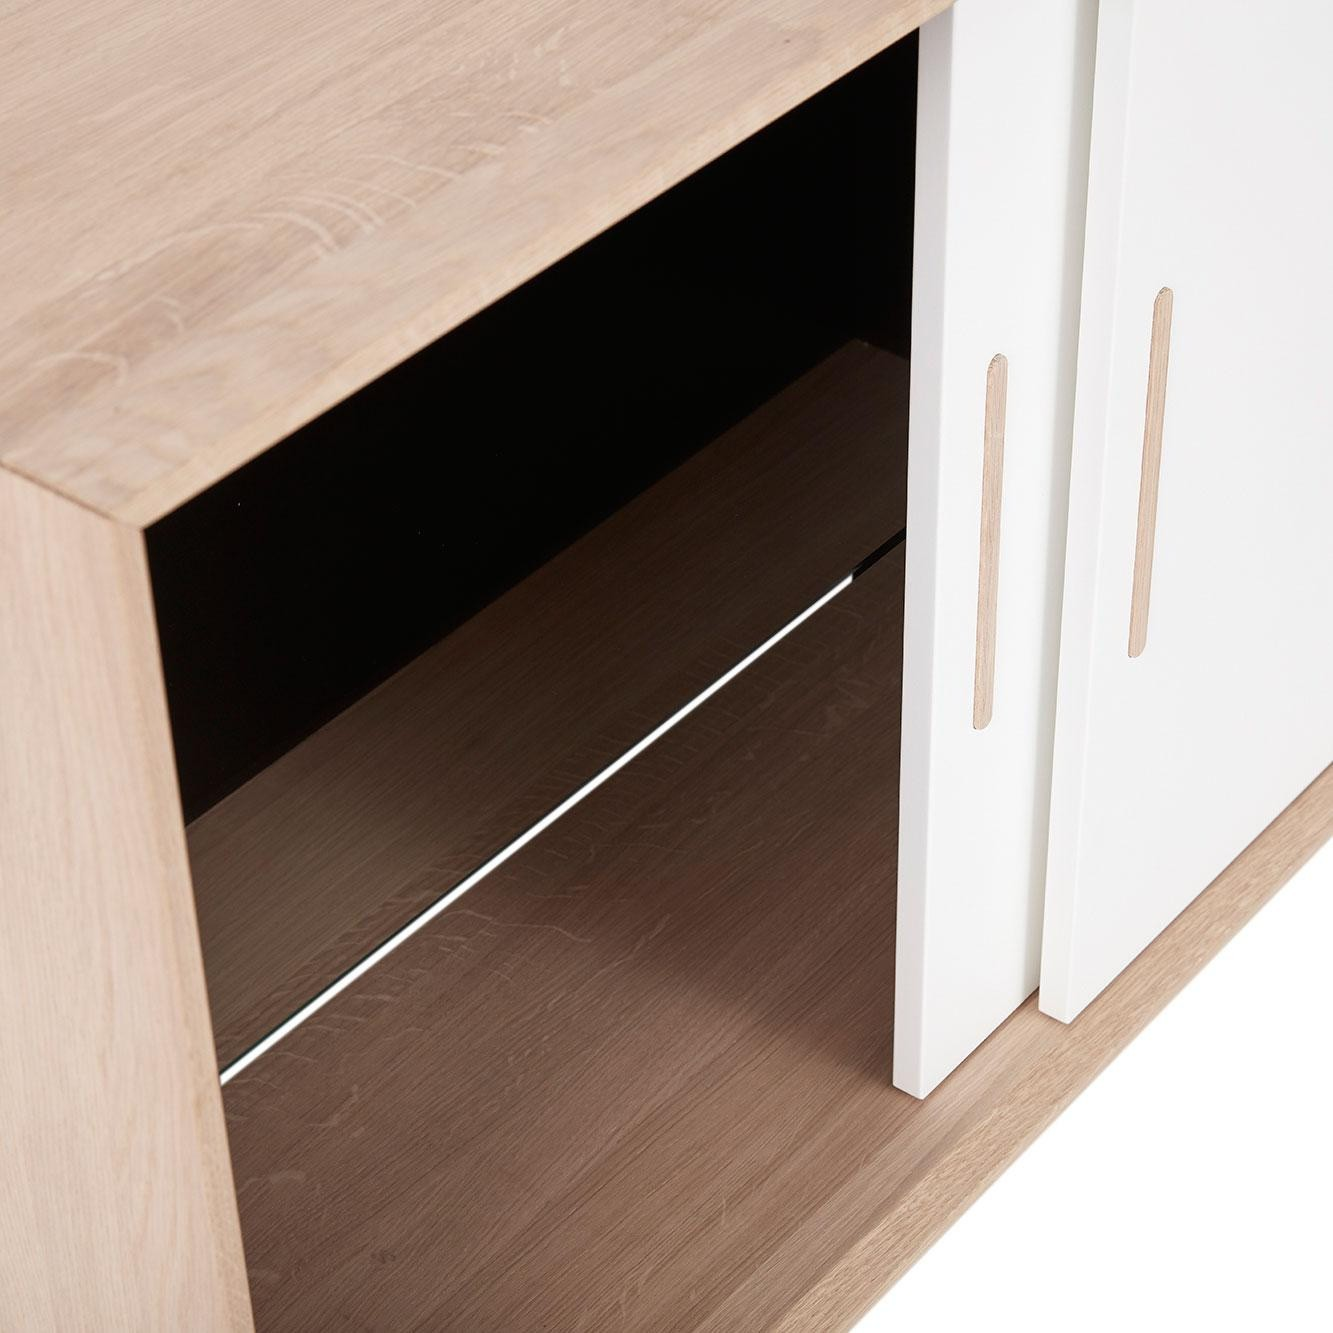 Andersen Furniture S4 Sideboard Wood Base Ambientedirect